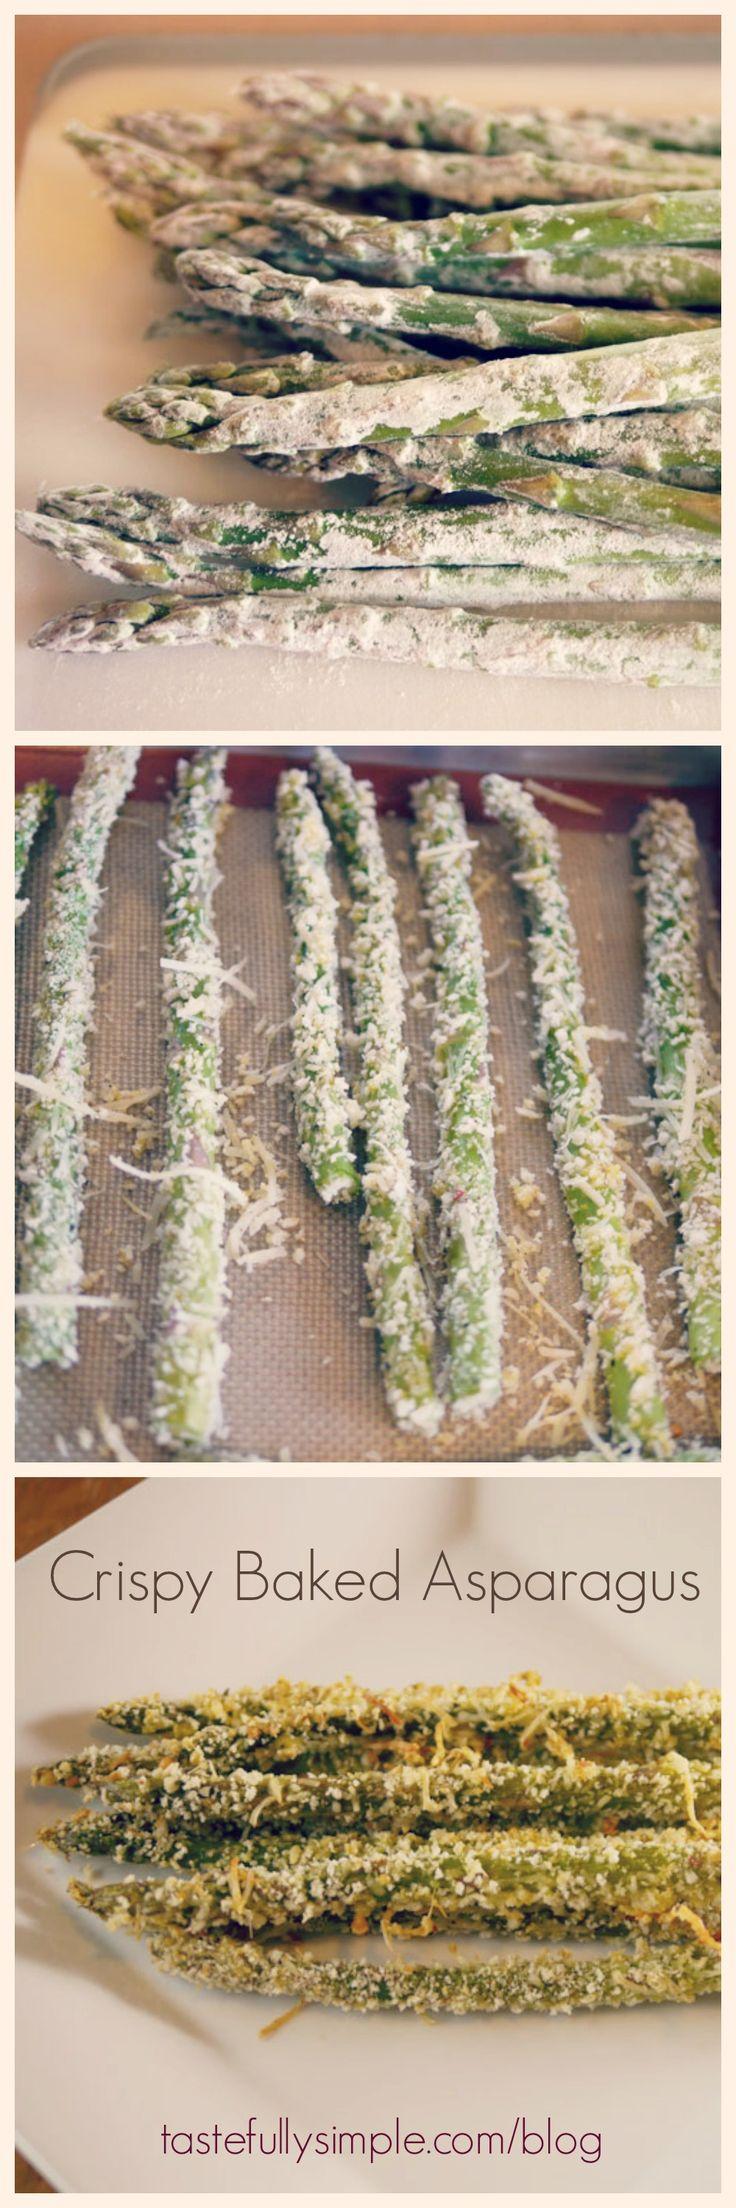 Crispy Baked Asparagus Recipe | Tastefully Simple